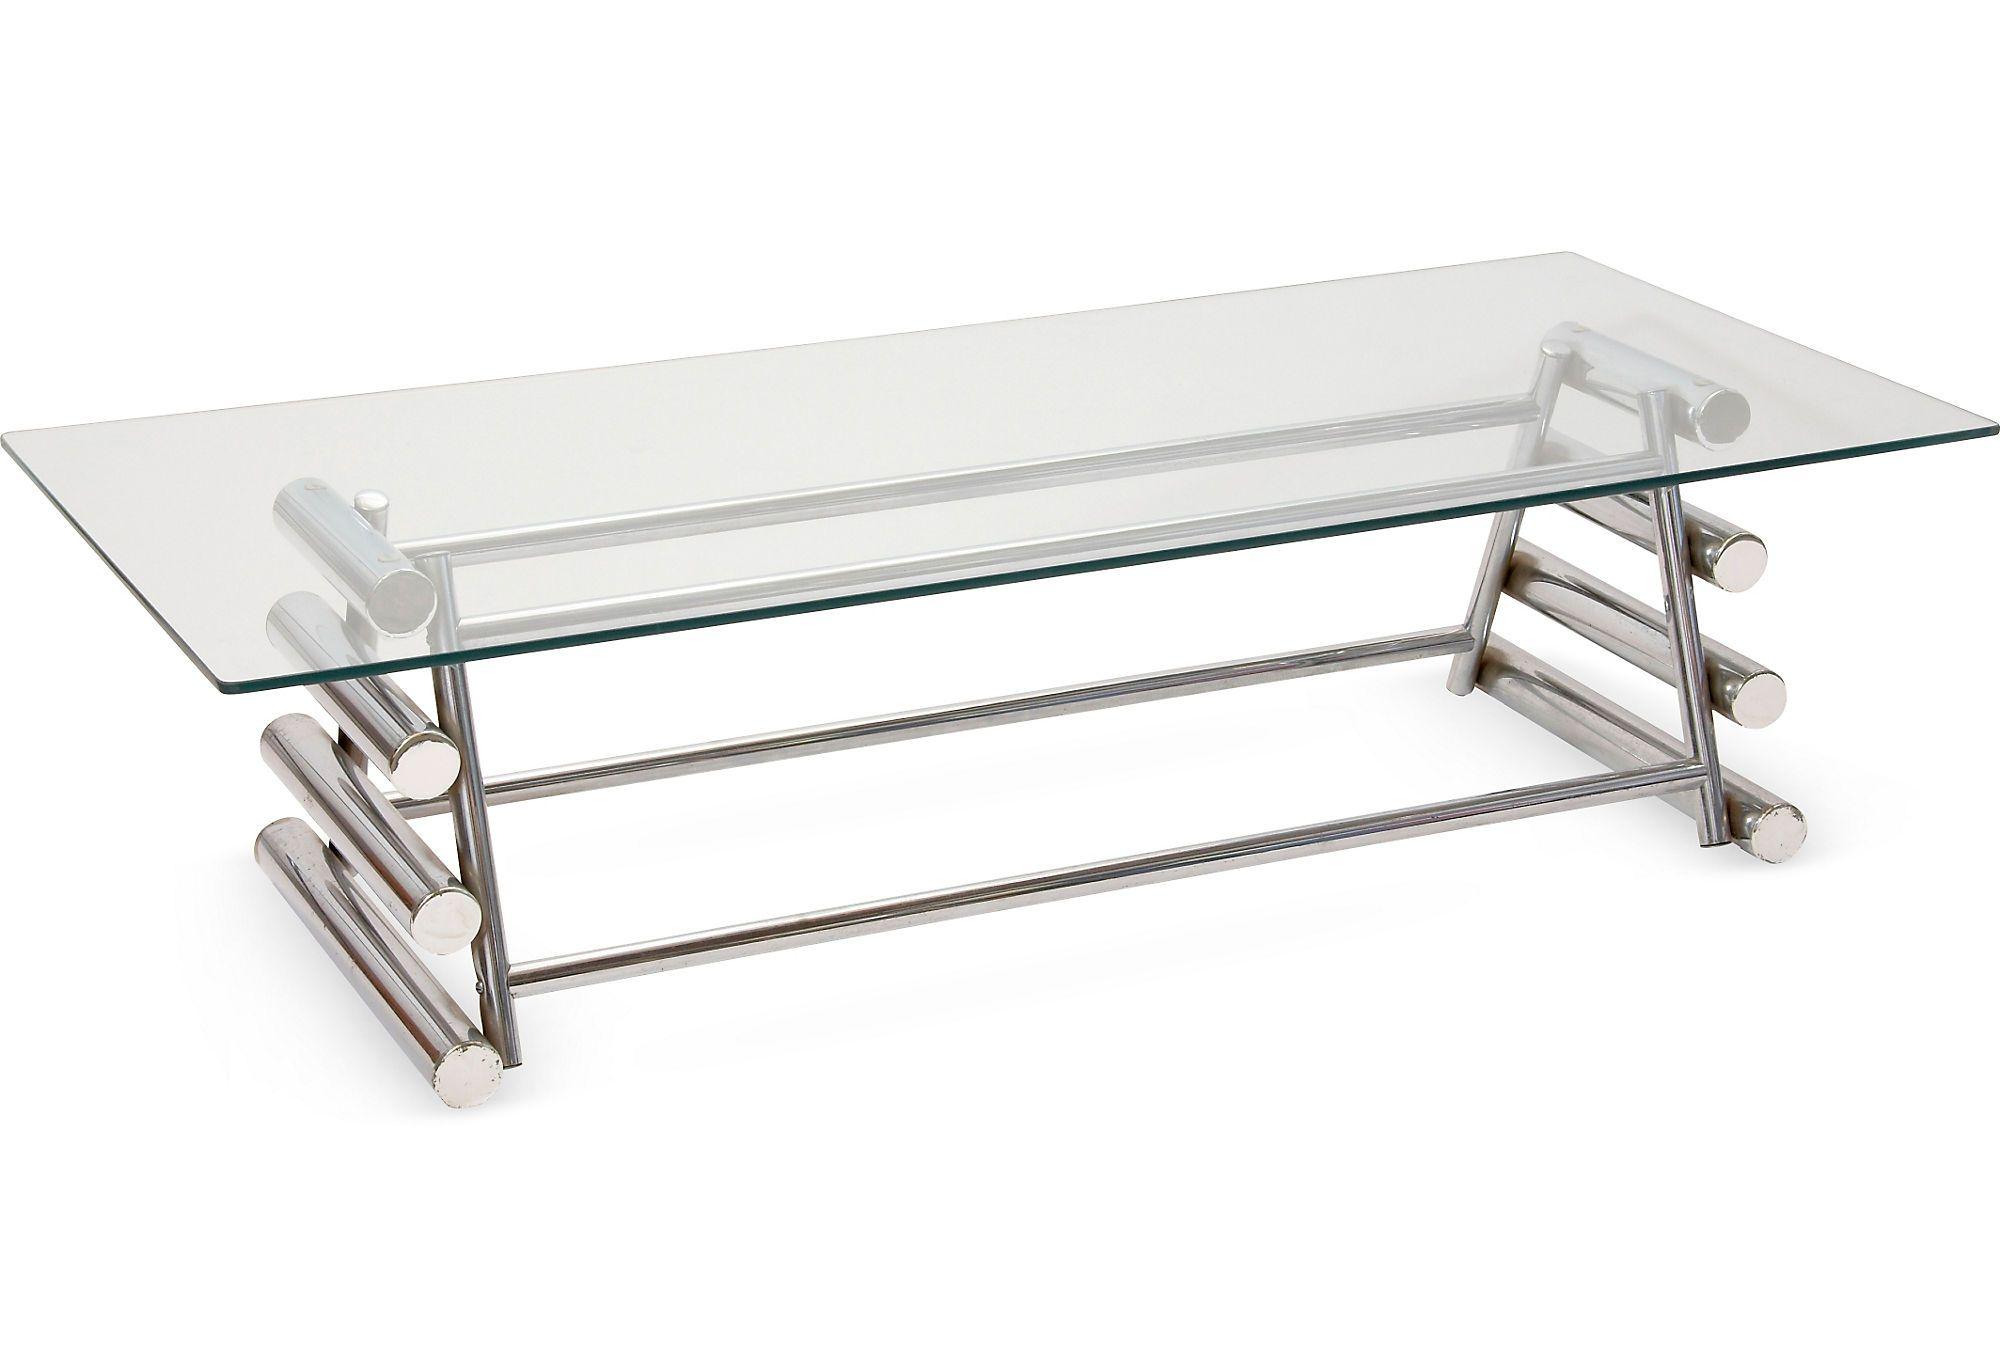 TROVE DECOR Chrome & Glass Coffee Table Coffee table